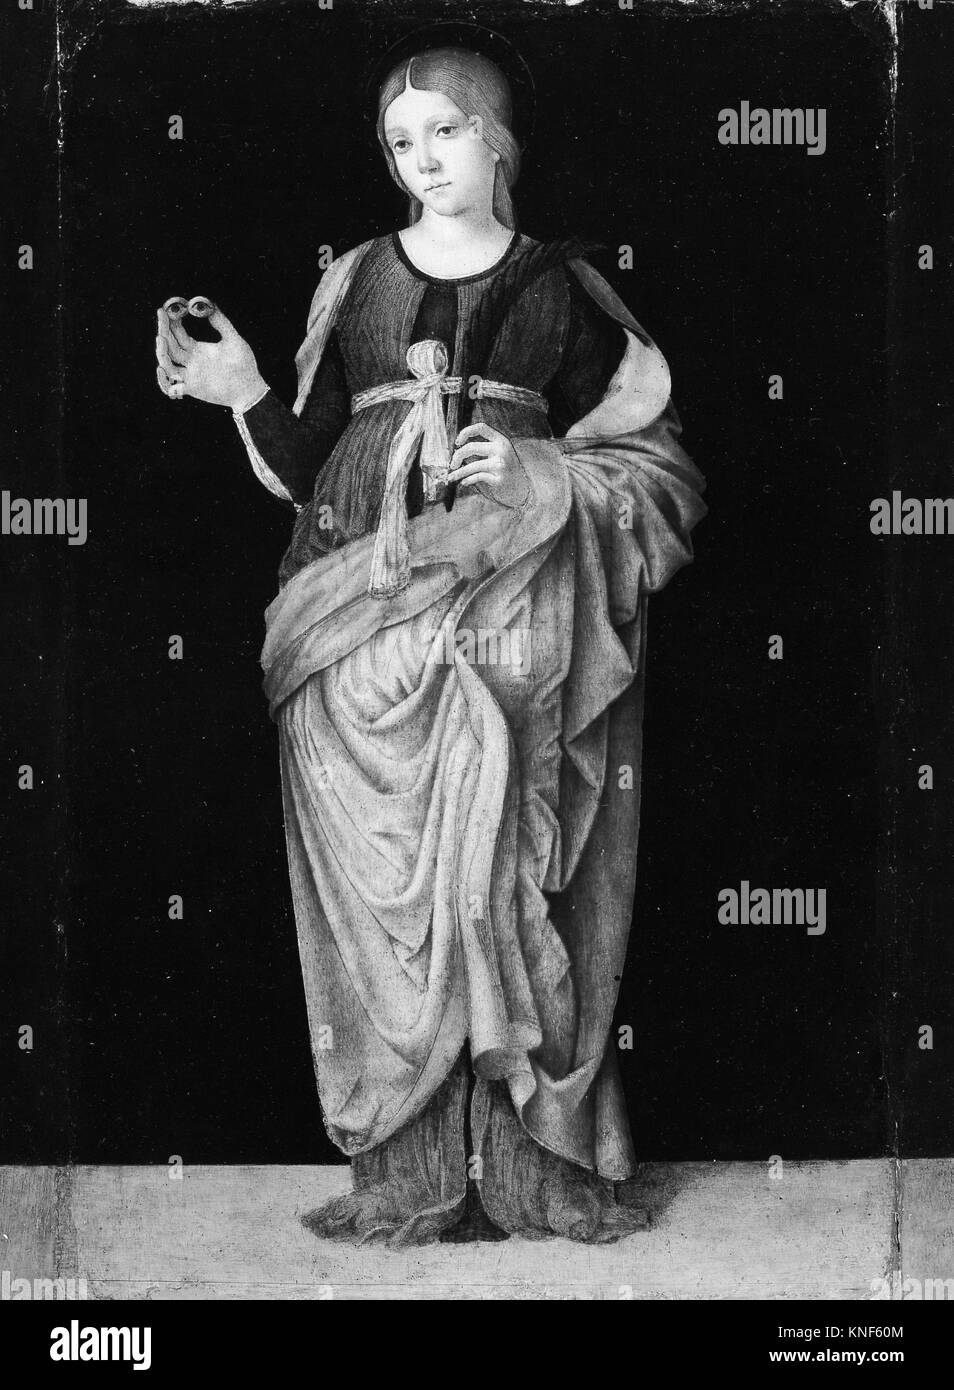 Saint Lucy. Artist: Francesco Zaganelli (Francesco di Bosio) (Italian, Romagnole, active by 1499-died 1532); Medium: - Stock Image